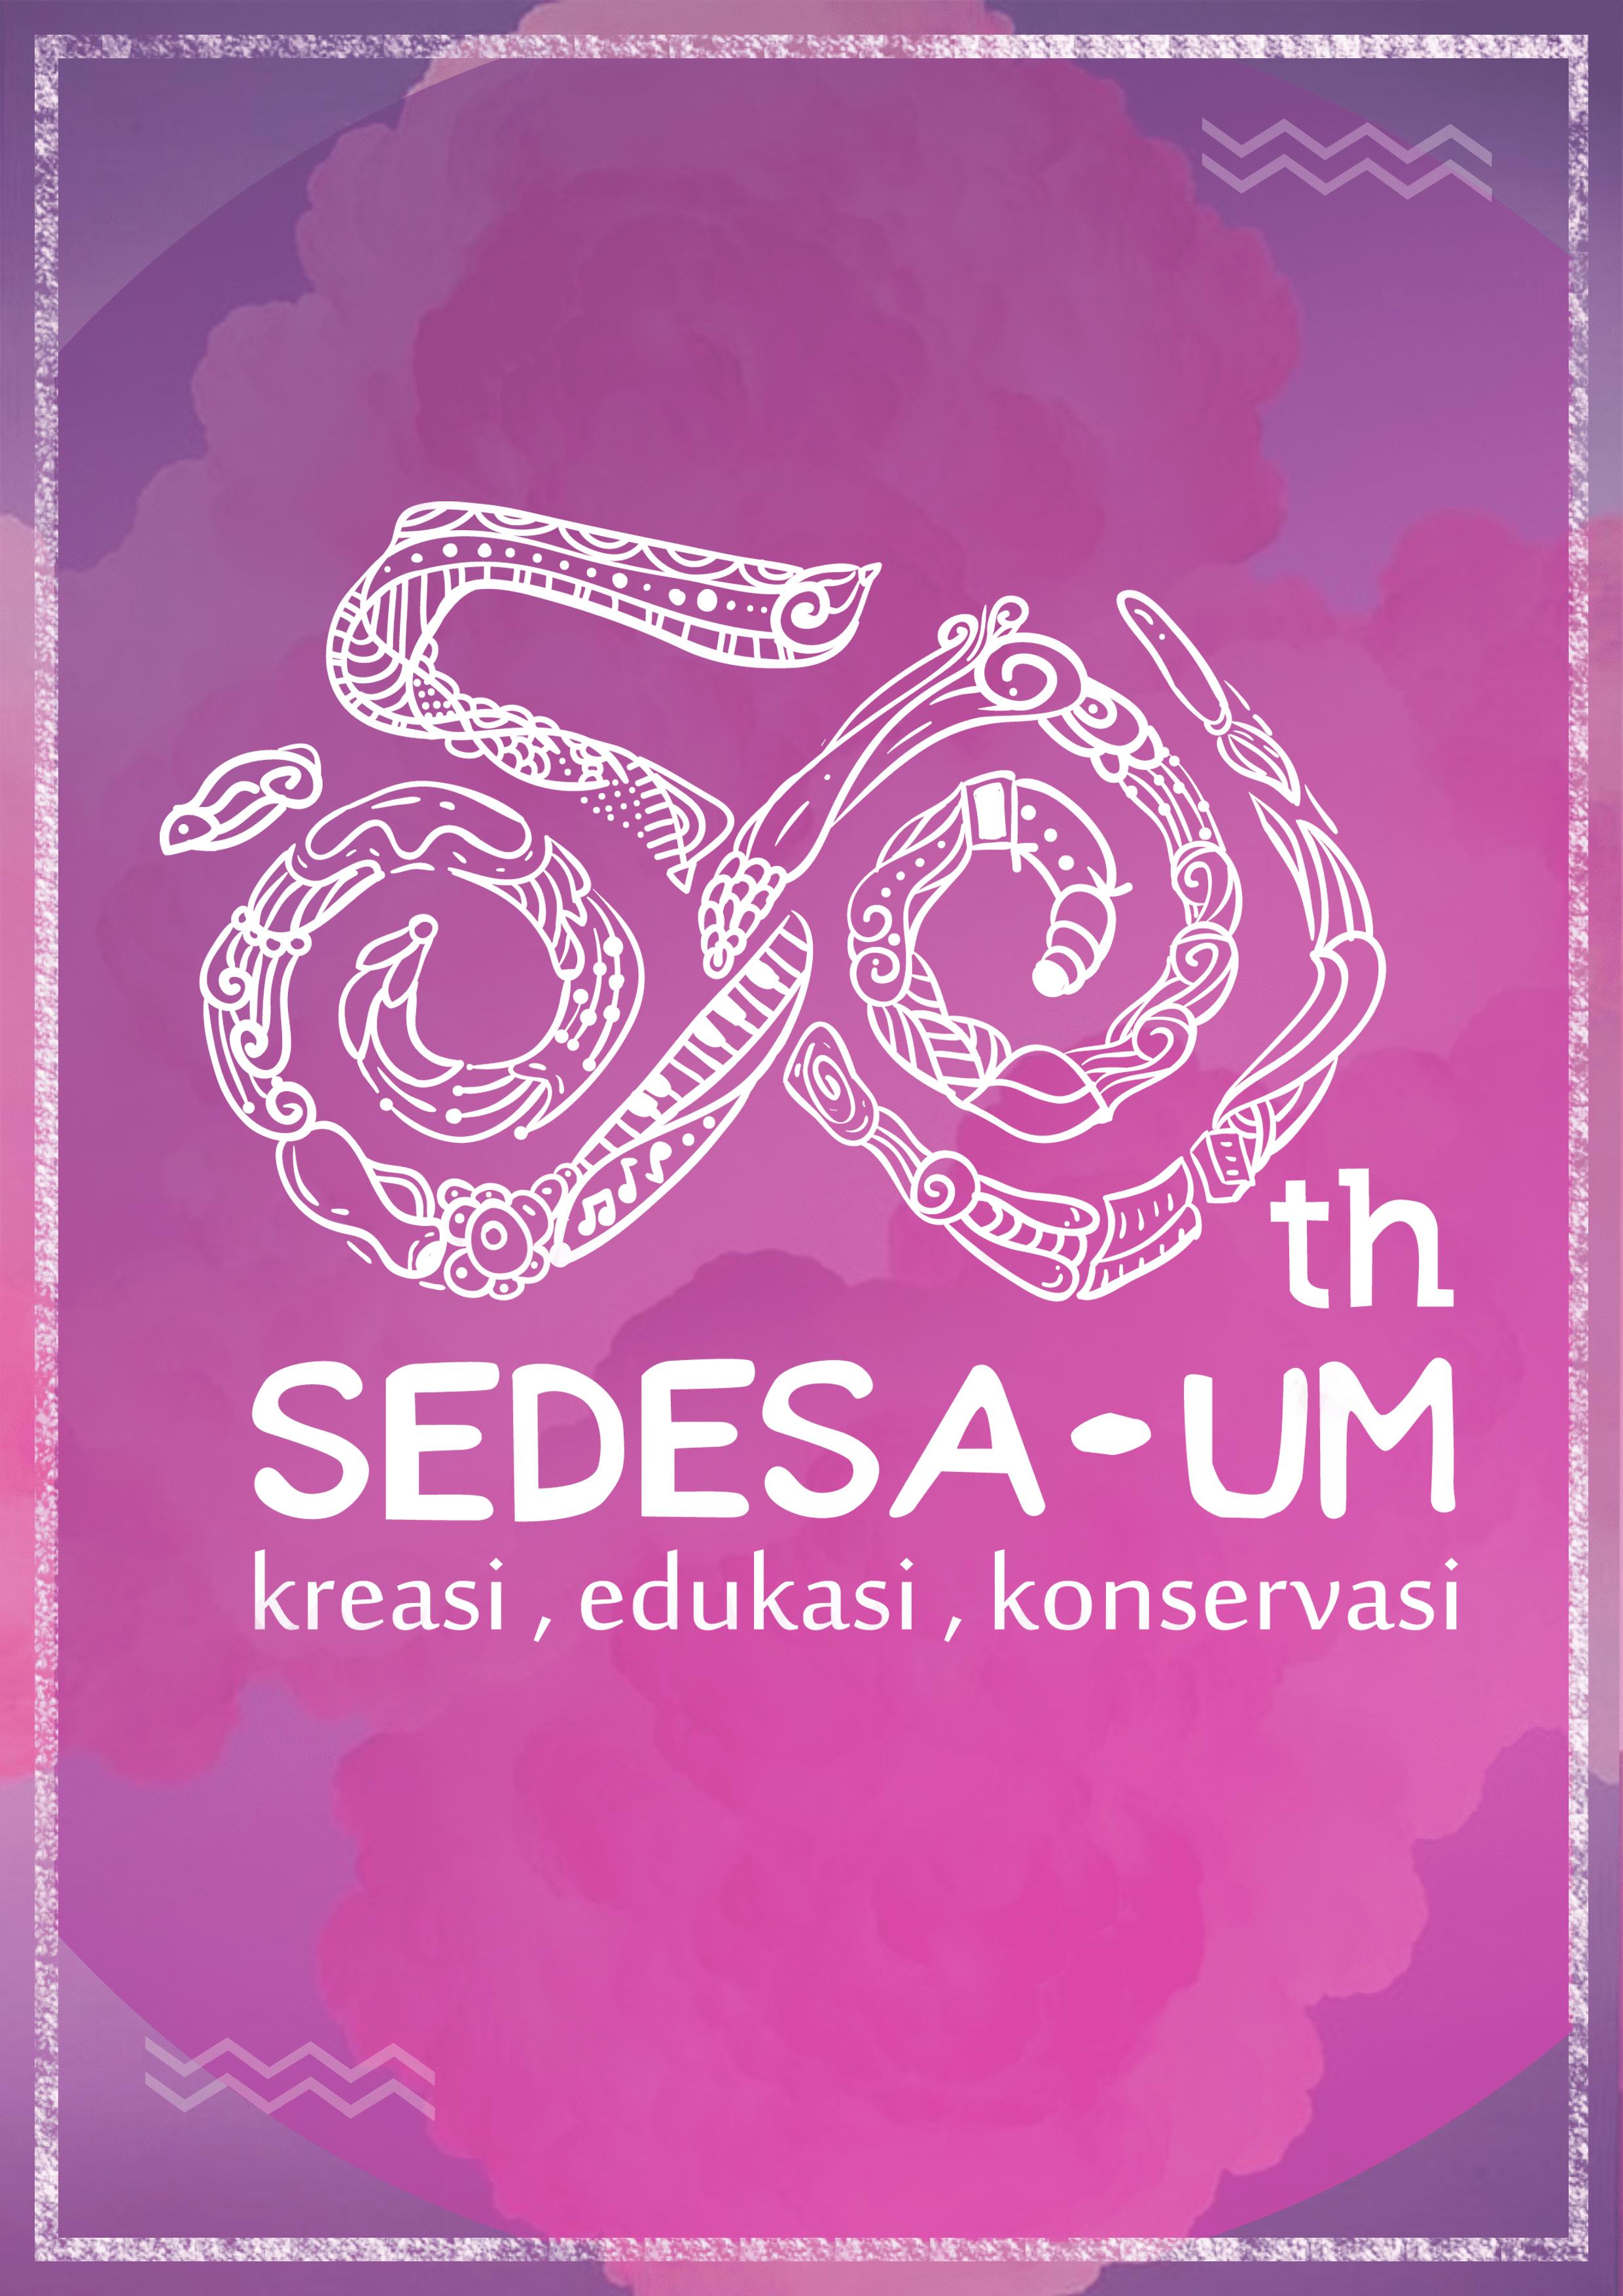 Anniversary Logo 50th Logo 50 Variation Logo Universitas Negeri Malang Um Indonesian University Indonesia Universitas Negeri Konservasi